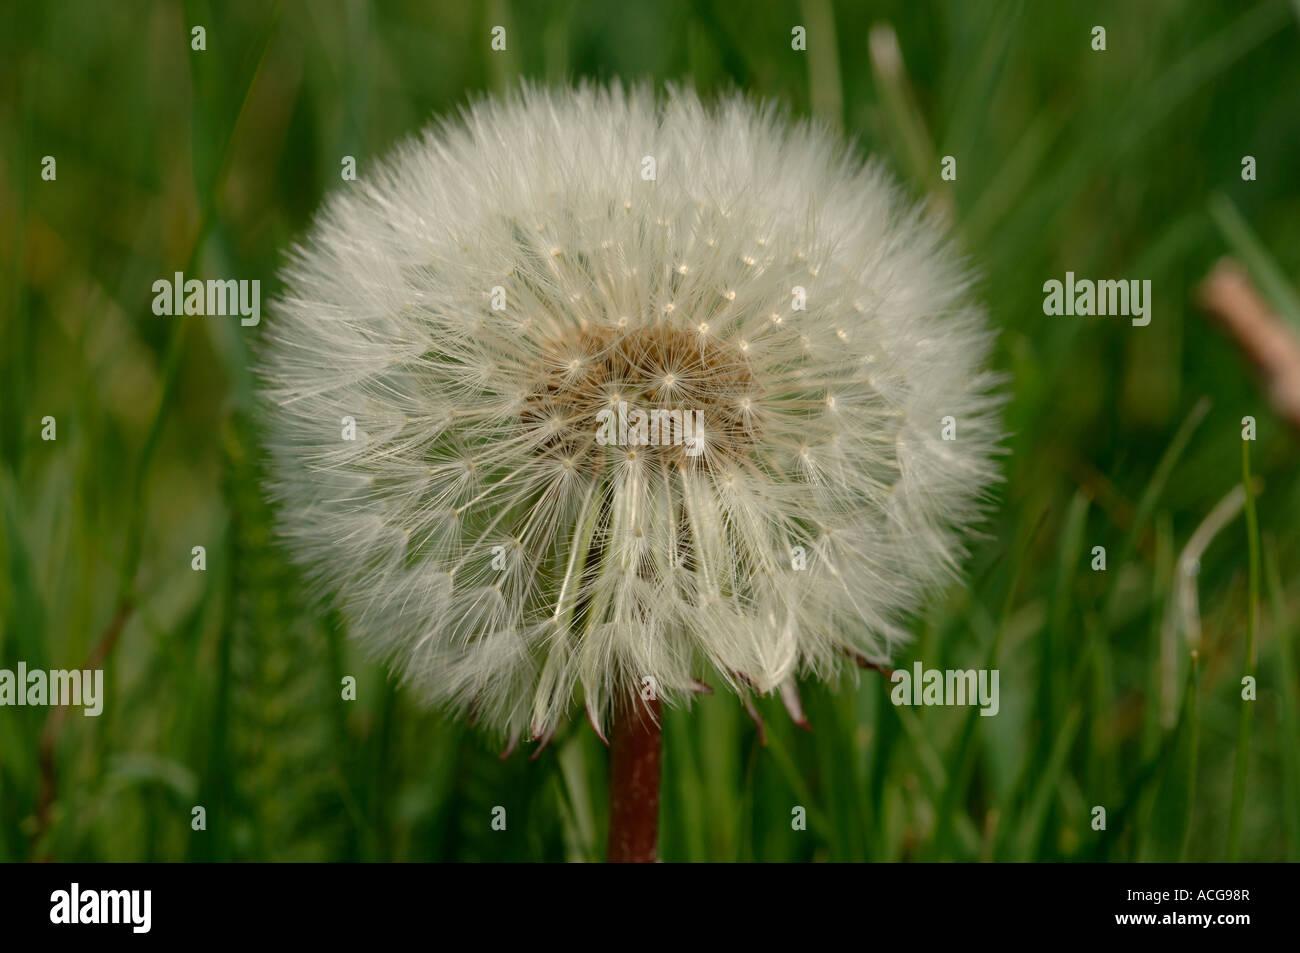 Dandelion Taraxacum officinale seedhead with grassland behind - Stock Image